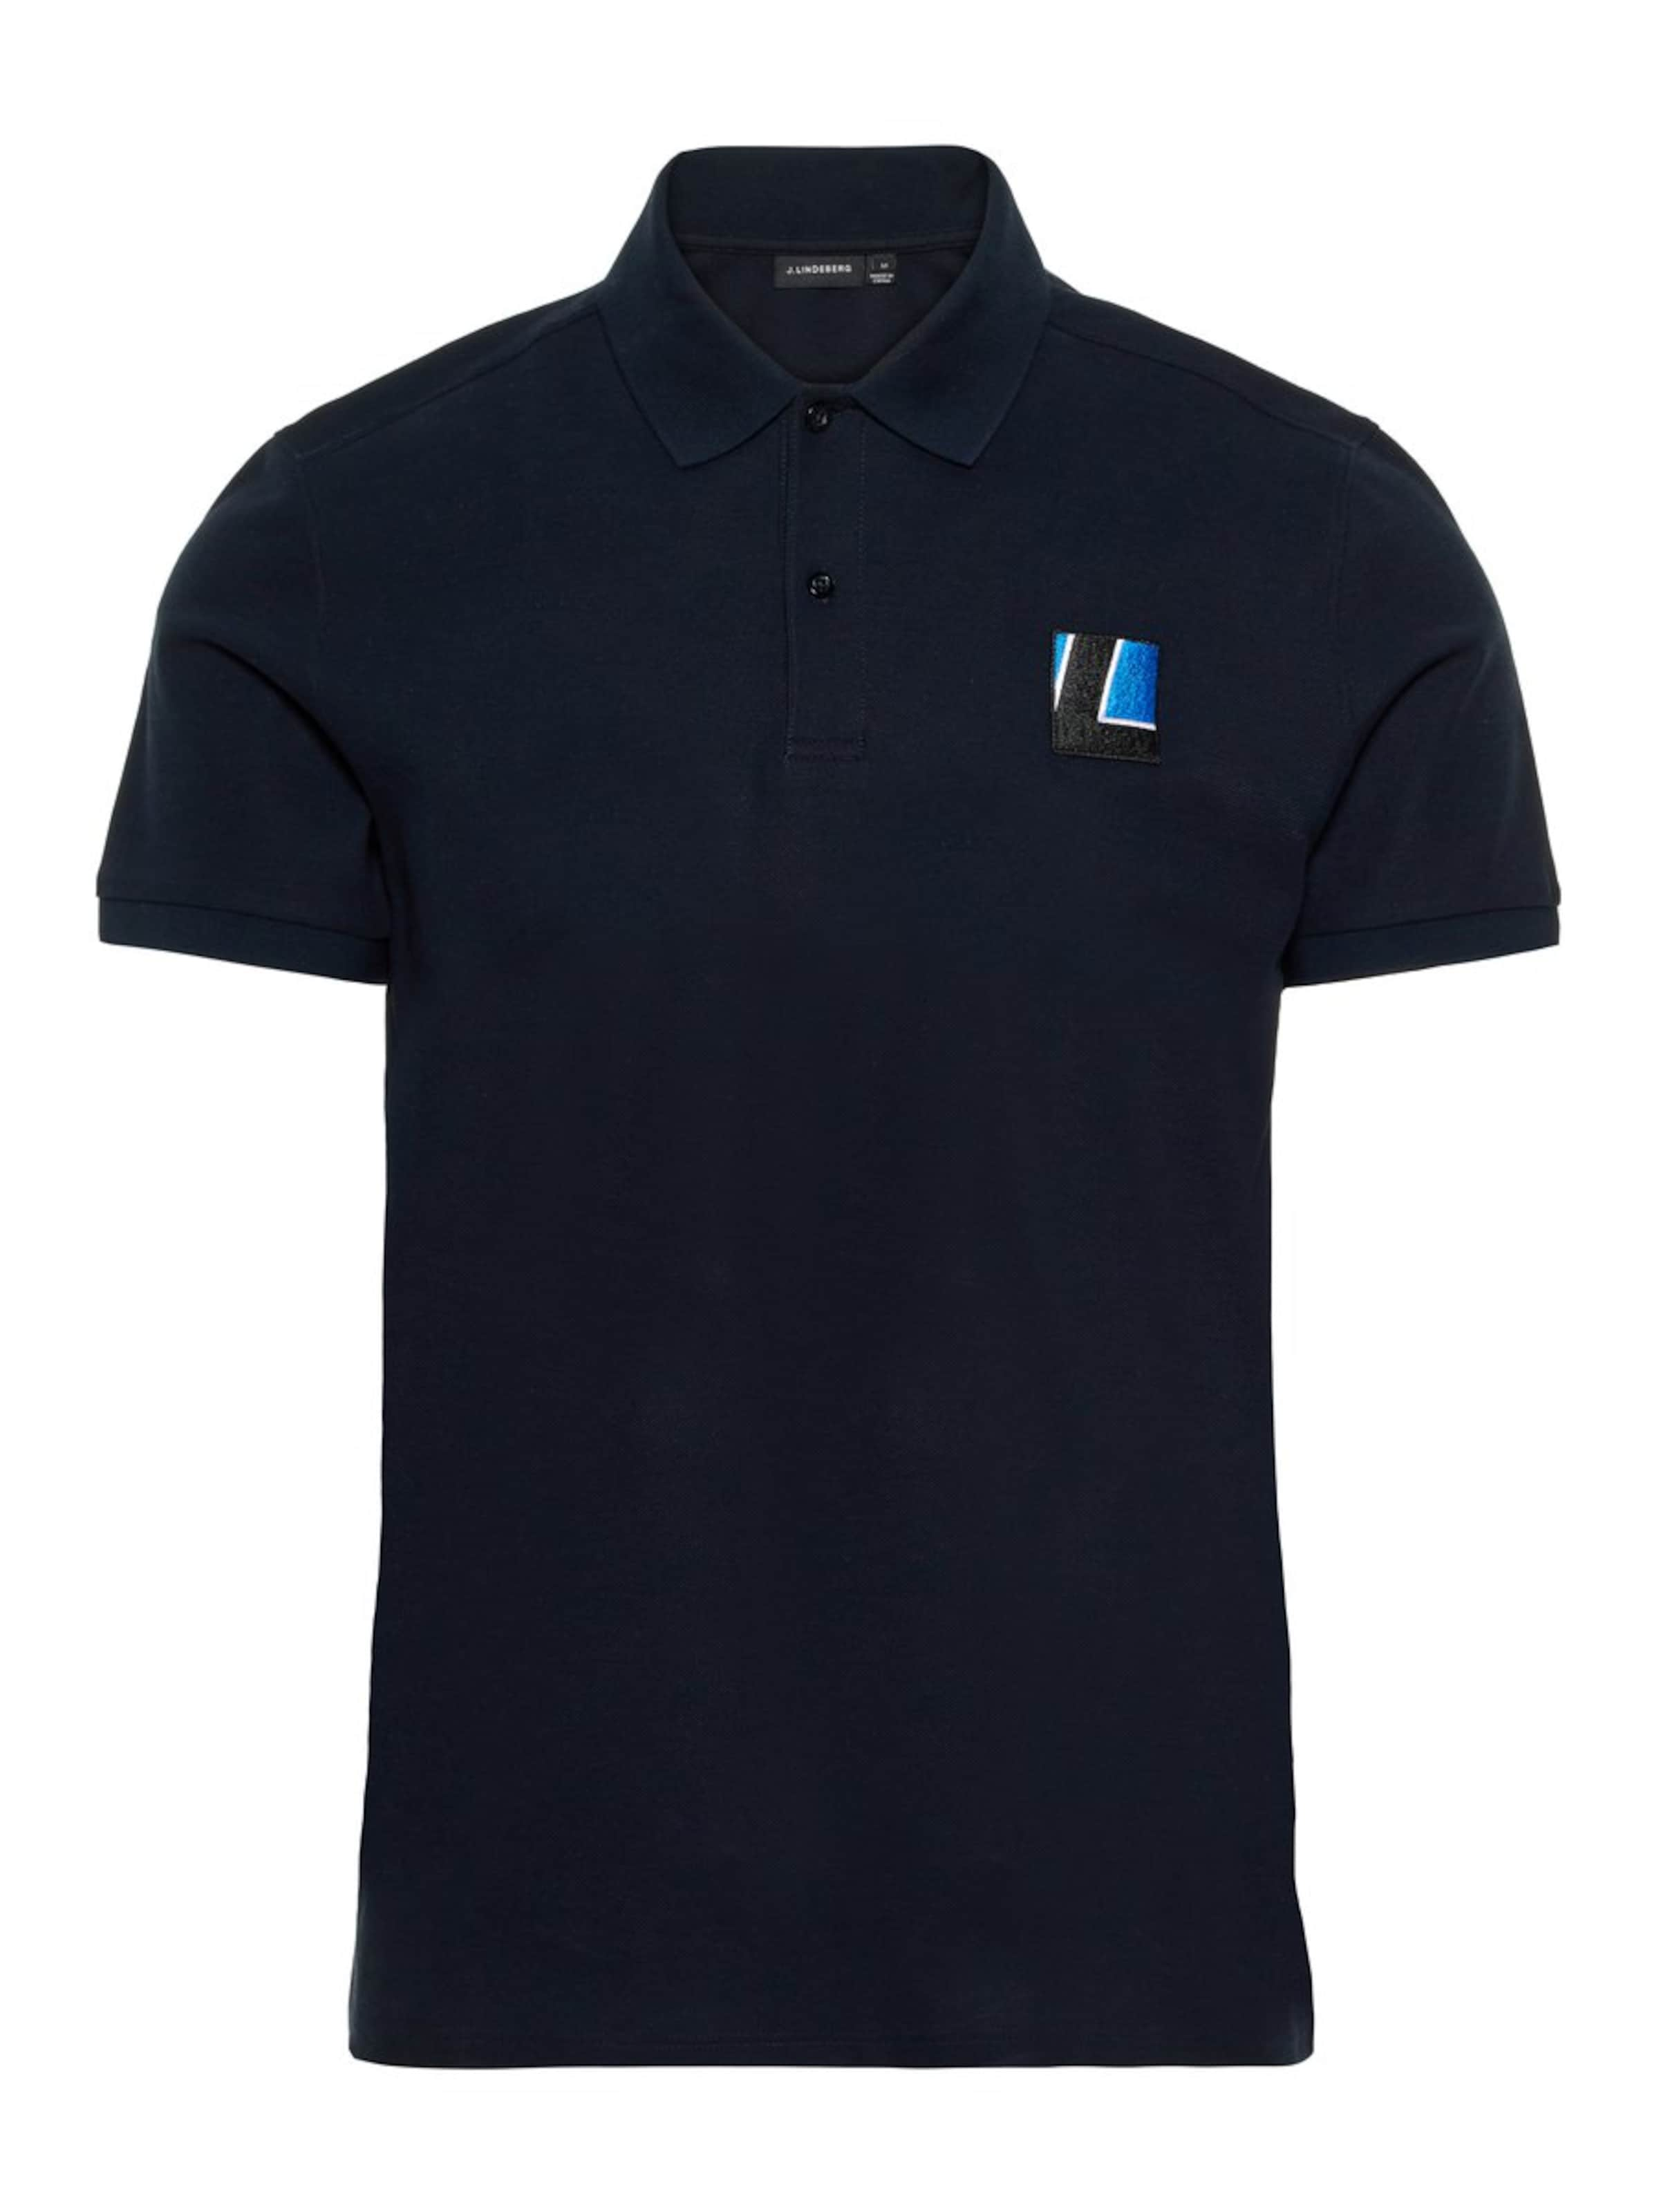 T J shirt Bleu lindeberg En Cobalt eEHW29IYD